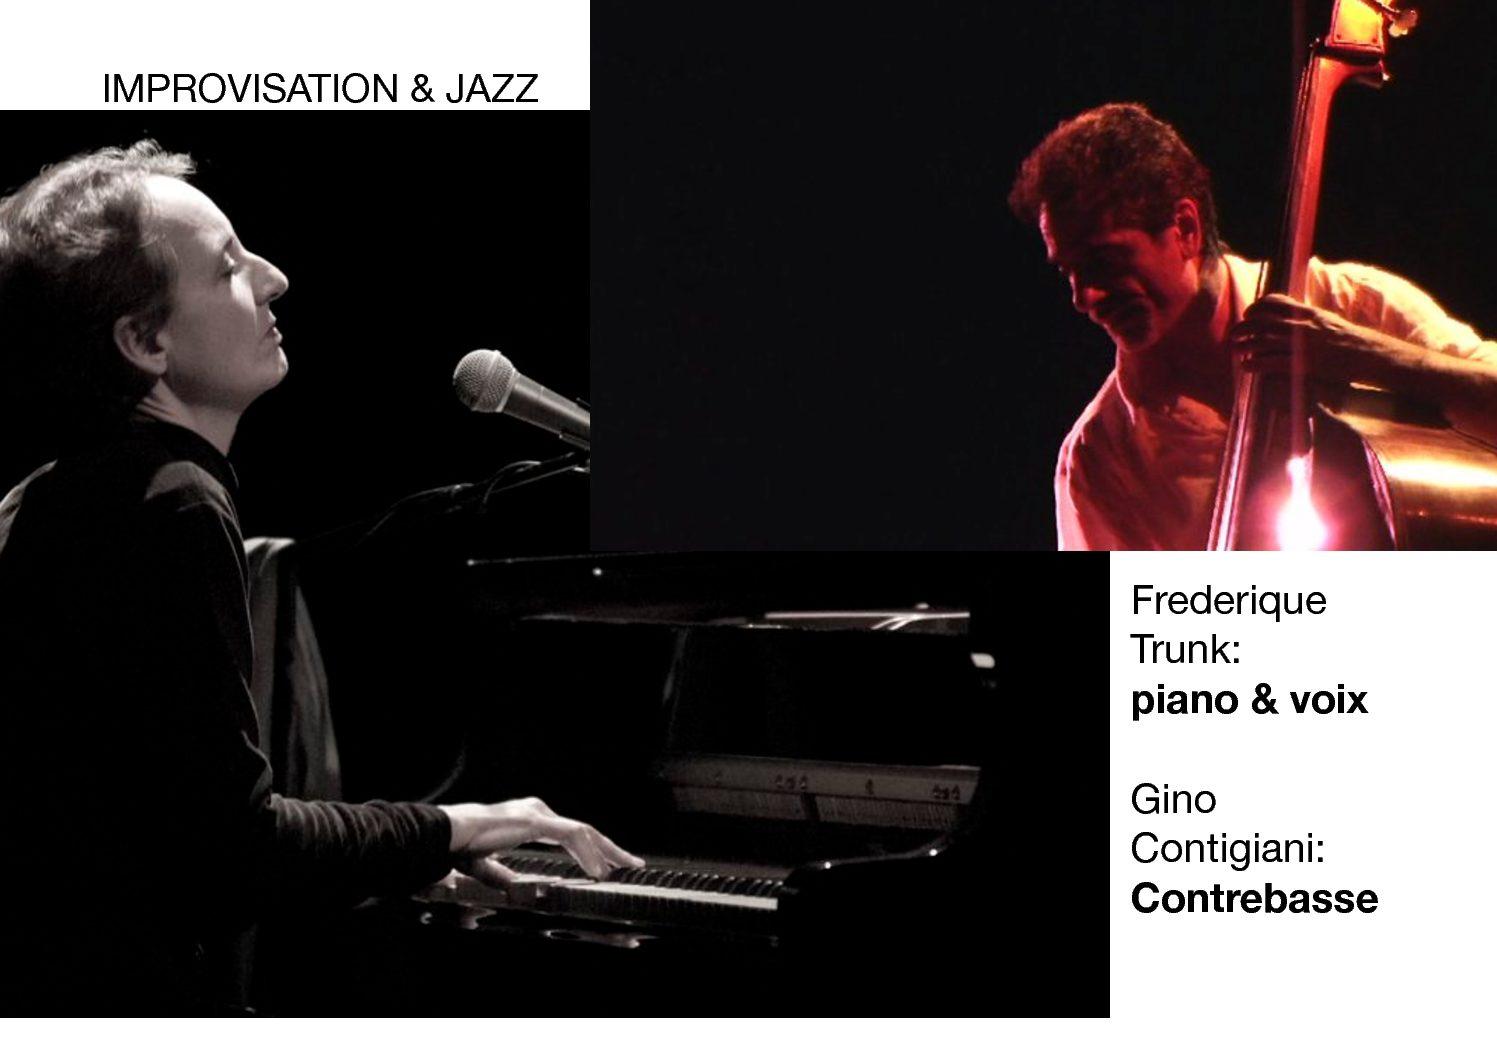 Duo Fred Gino